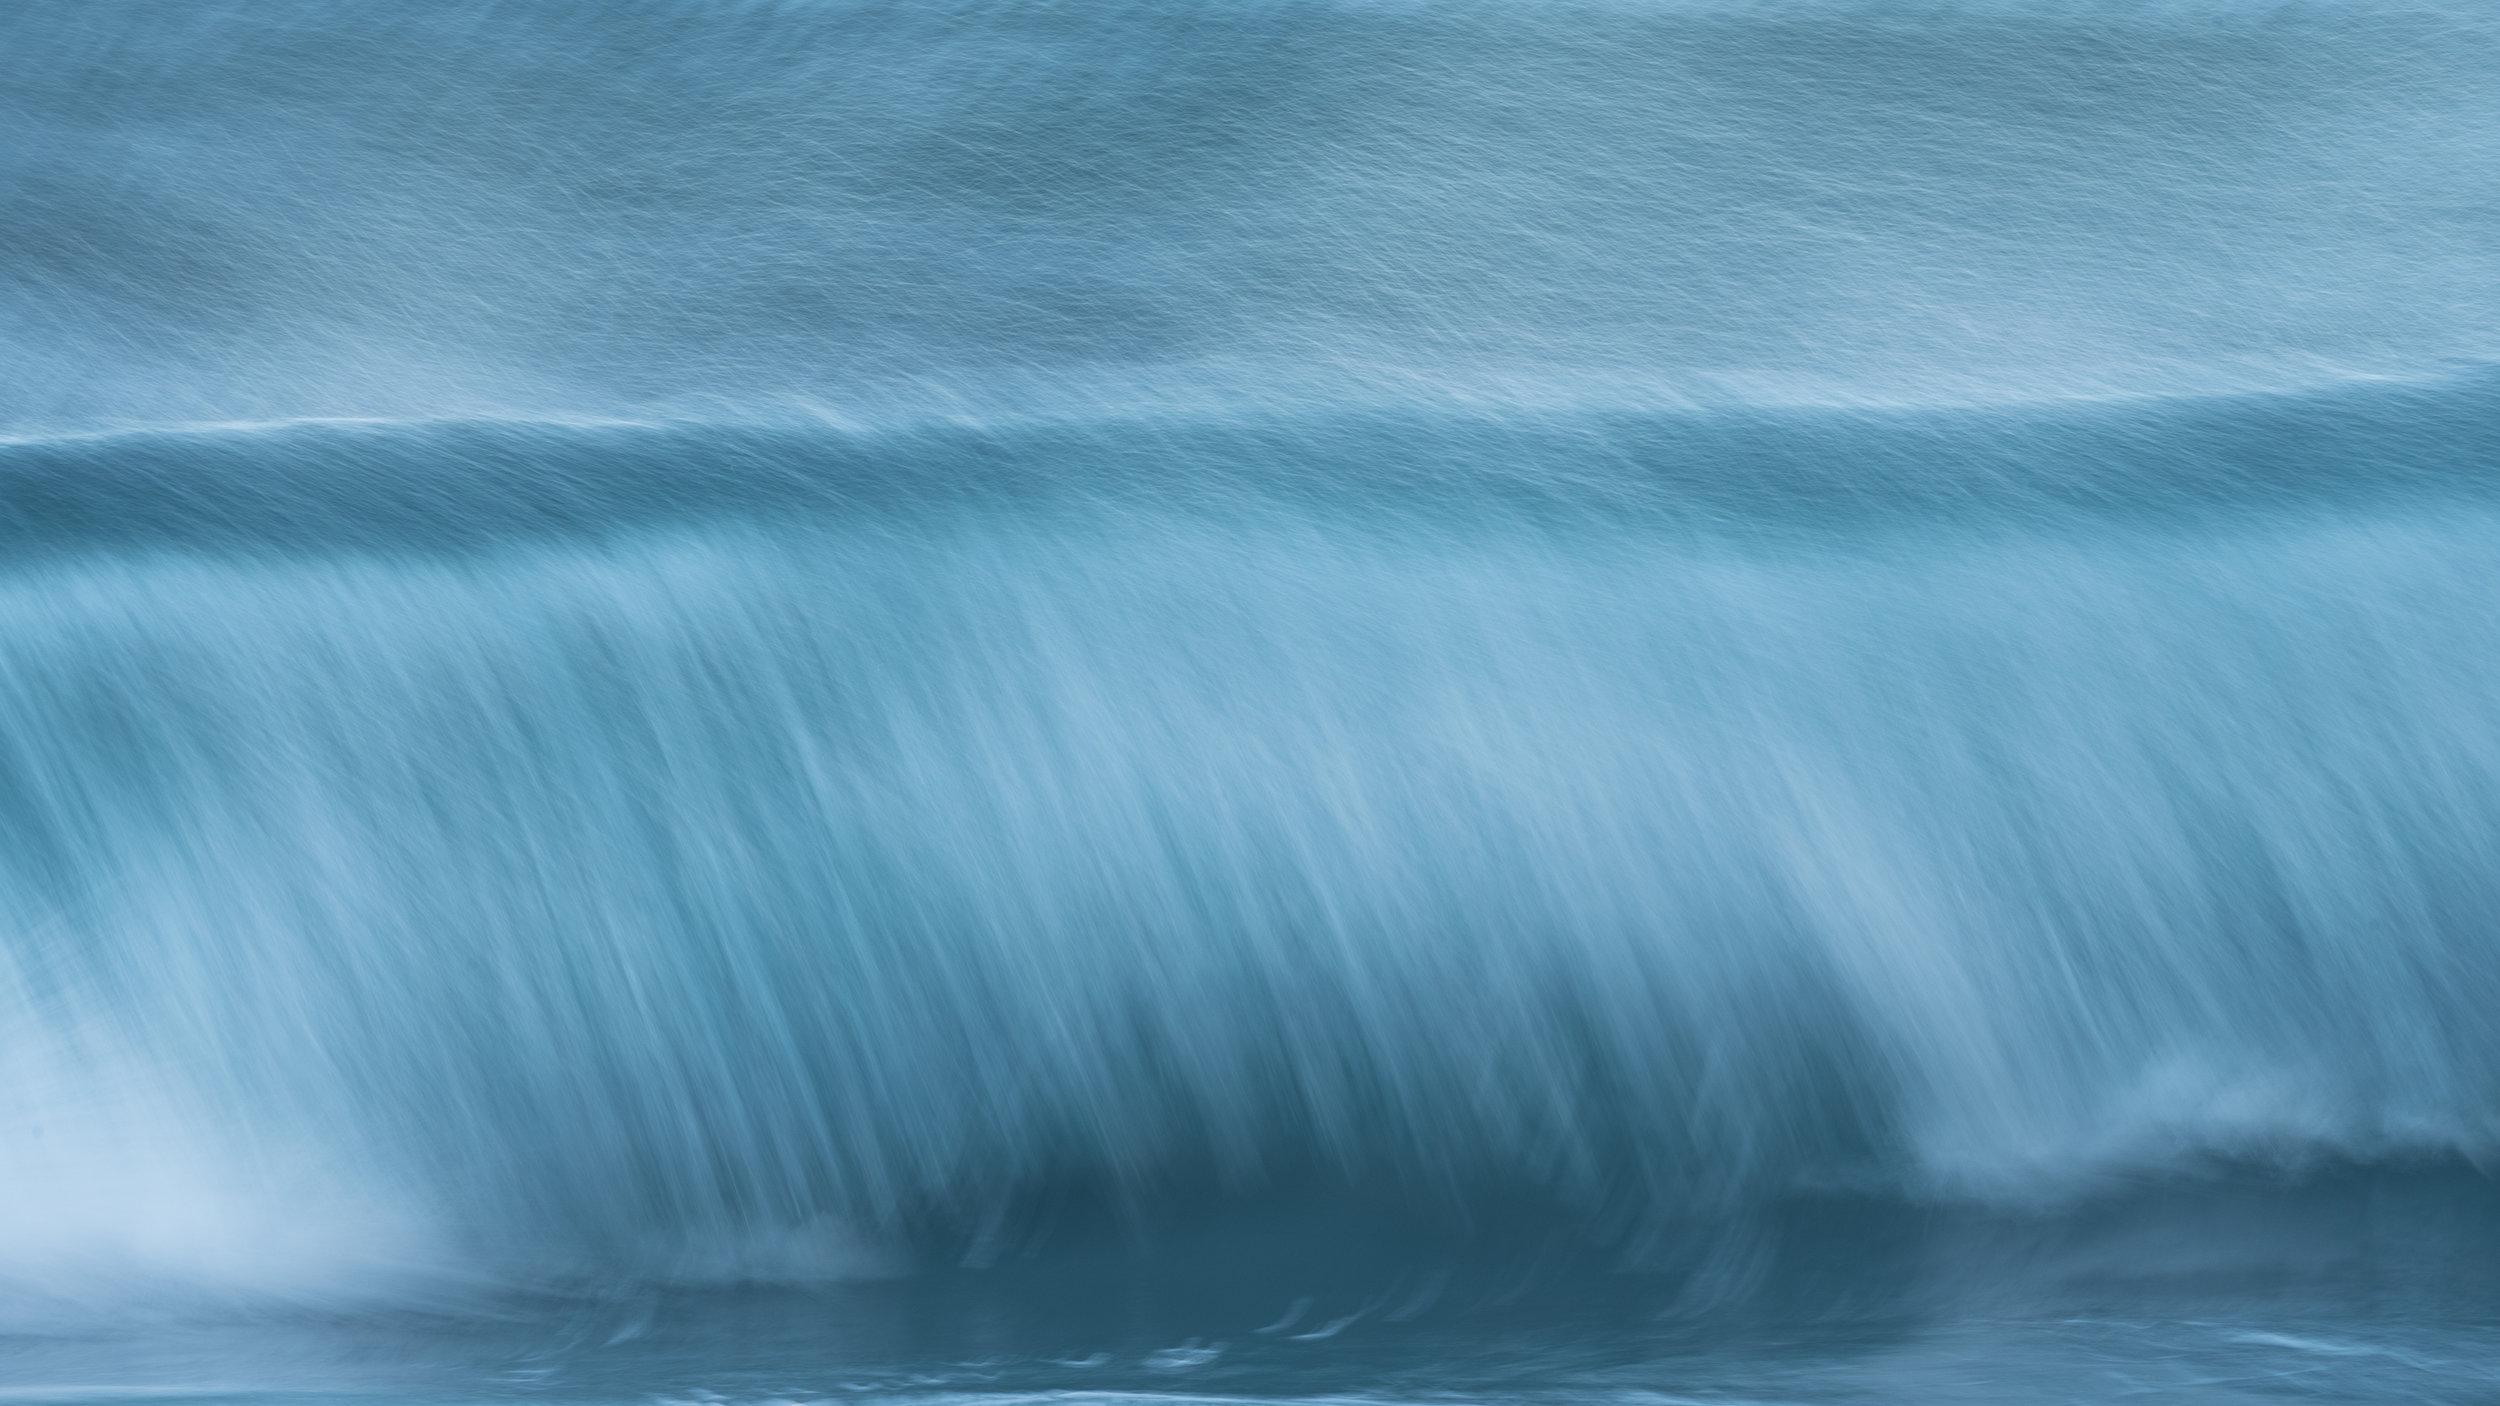 Waves at Unstad-DSC_7370-2-©Bjørn Joachimsen-2.jpg